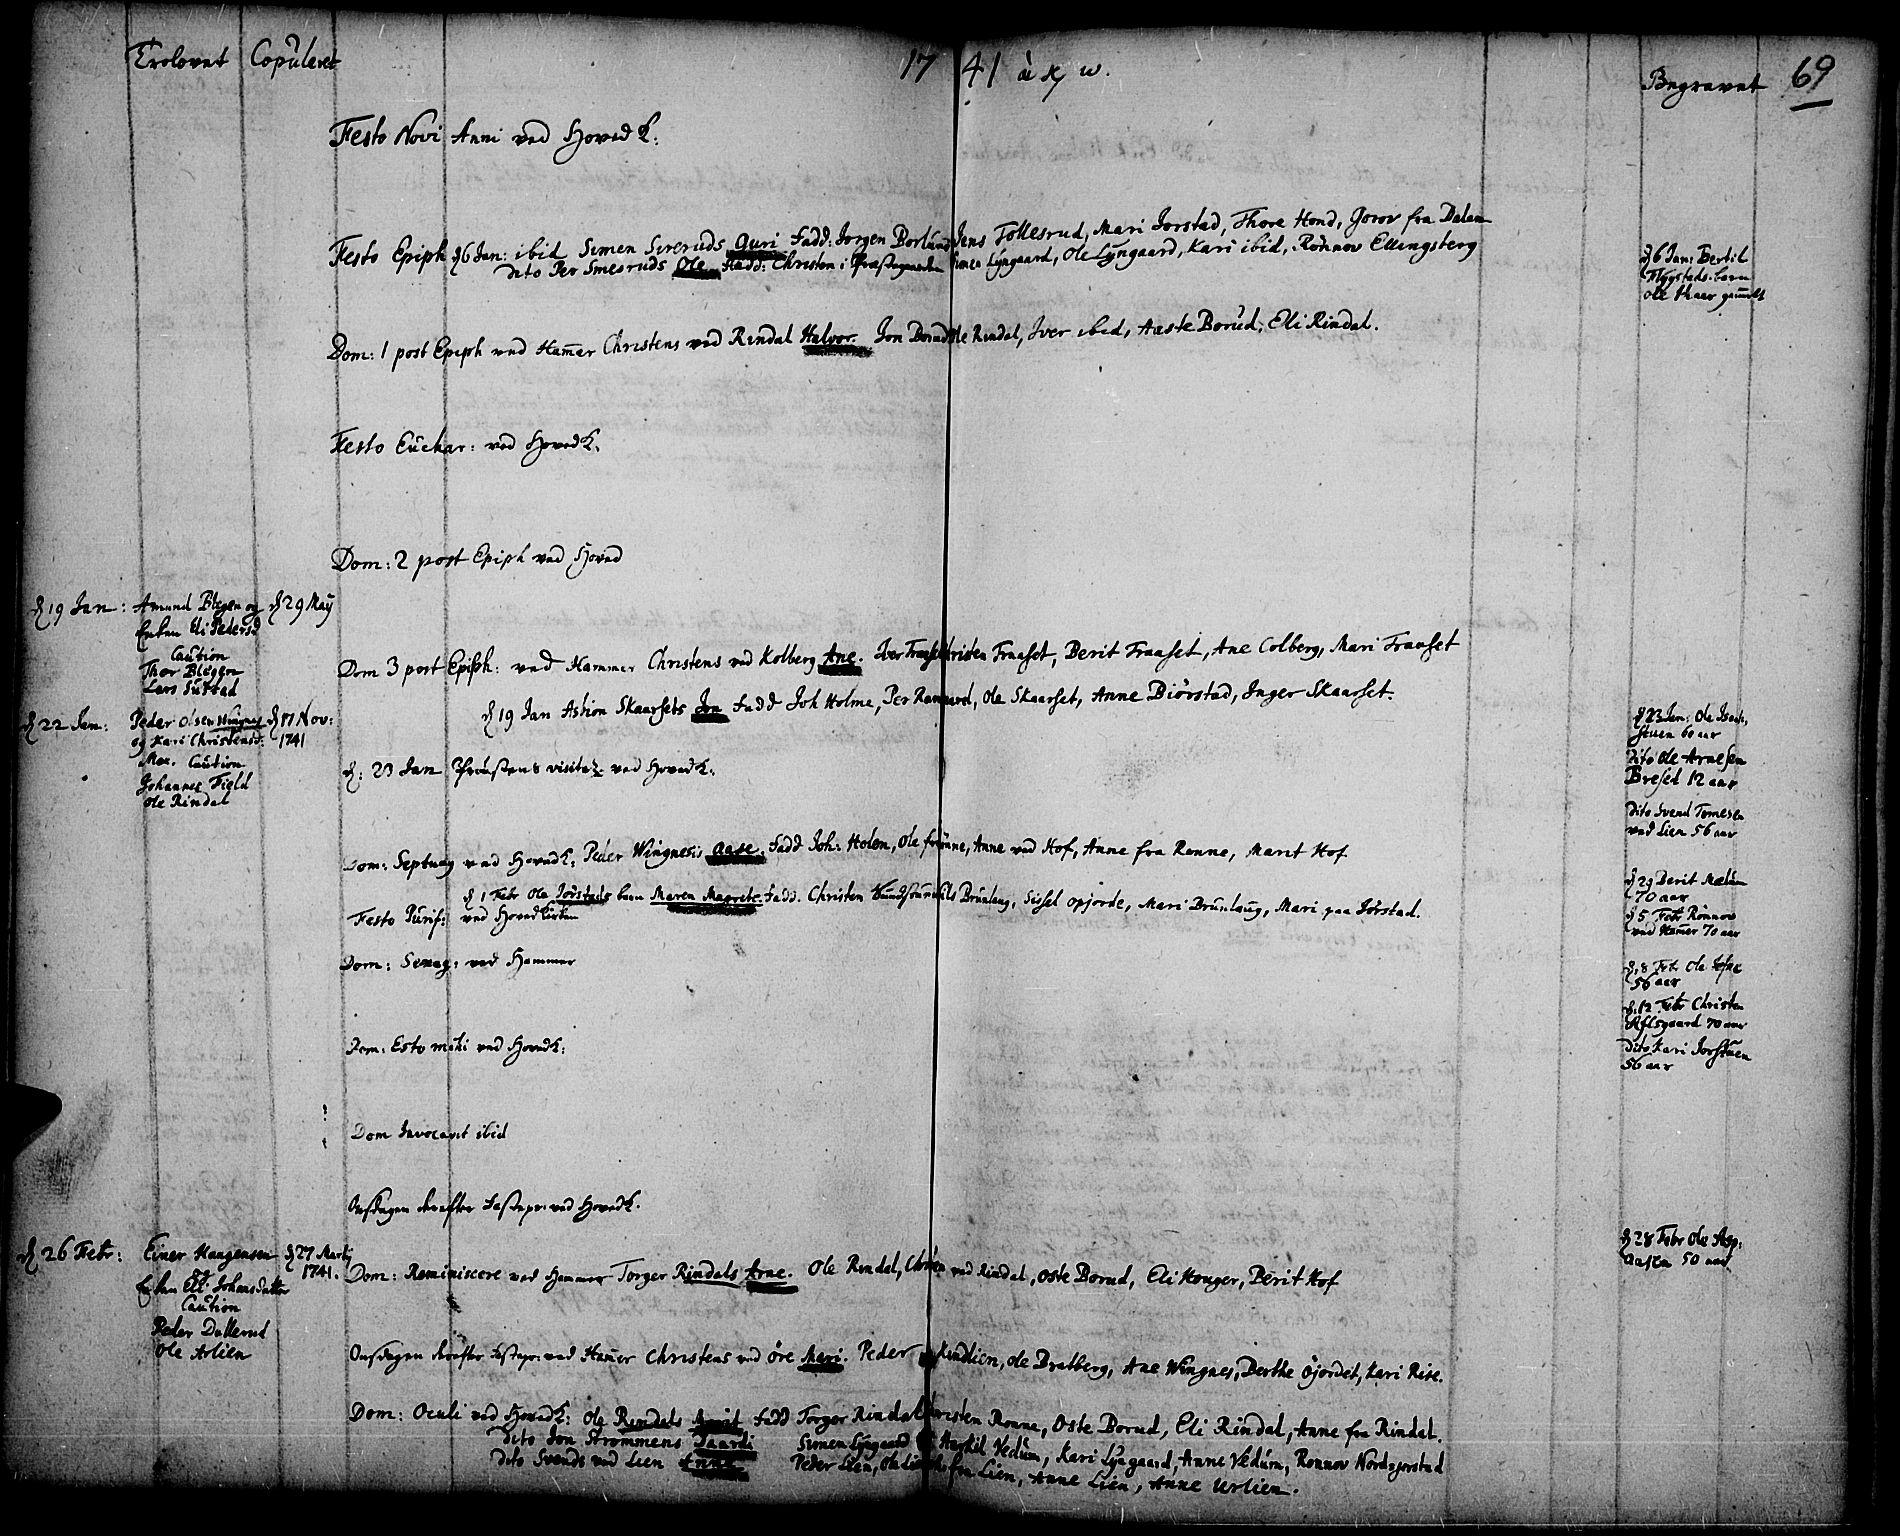 SAH, Fåberg prestekontor, Ministerialbok nr. 1, 1727-1775, s. 69